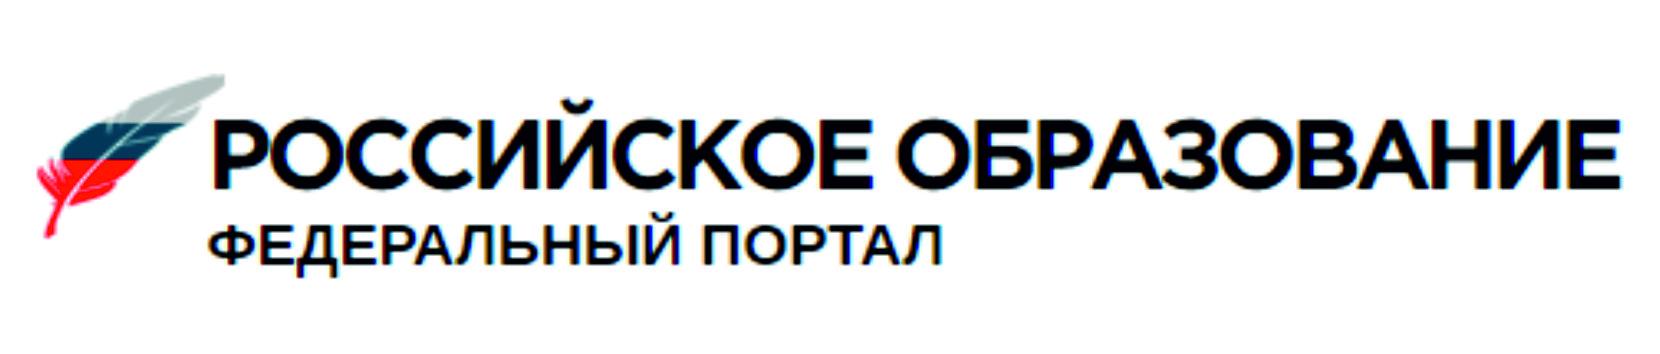 partner image